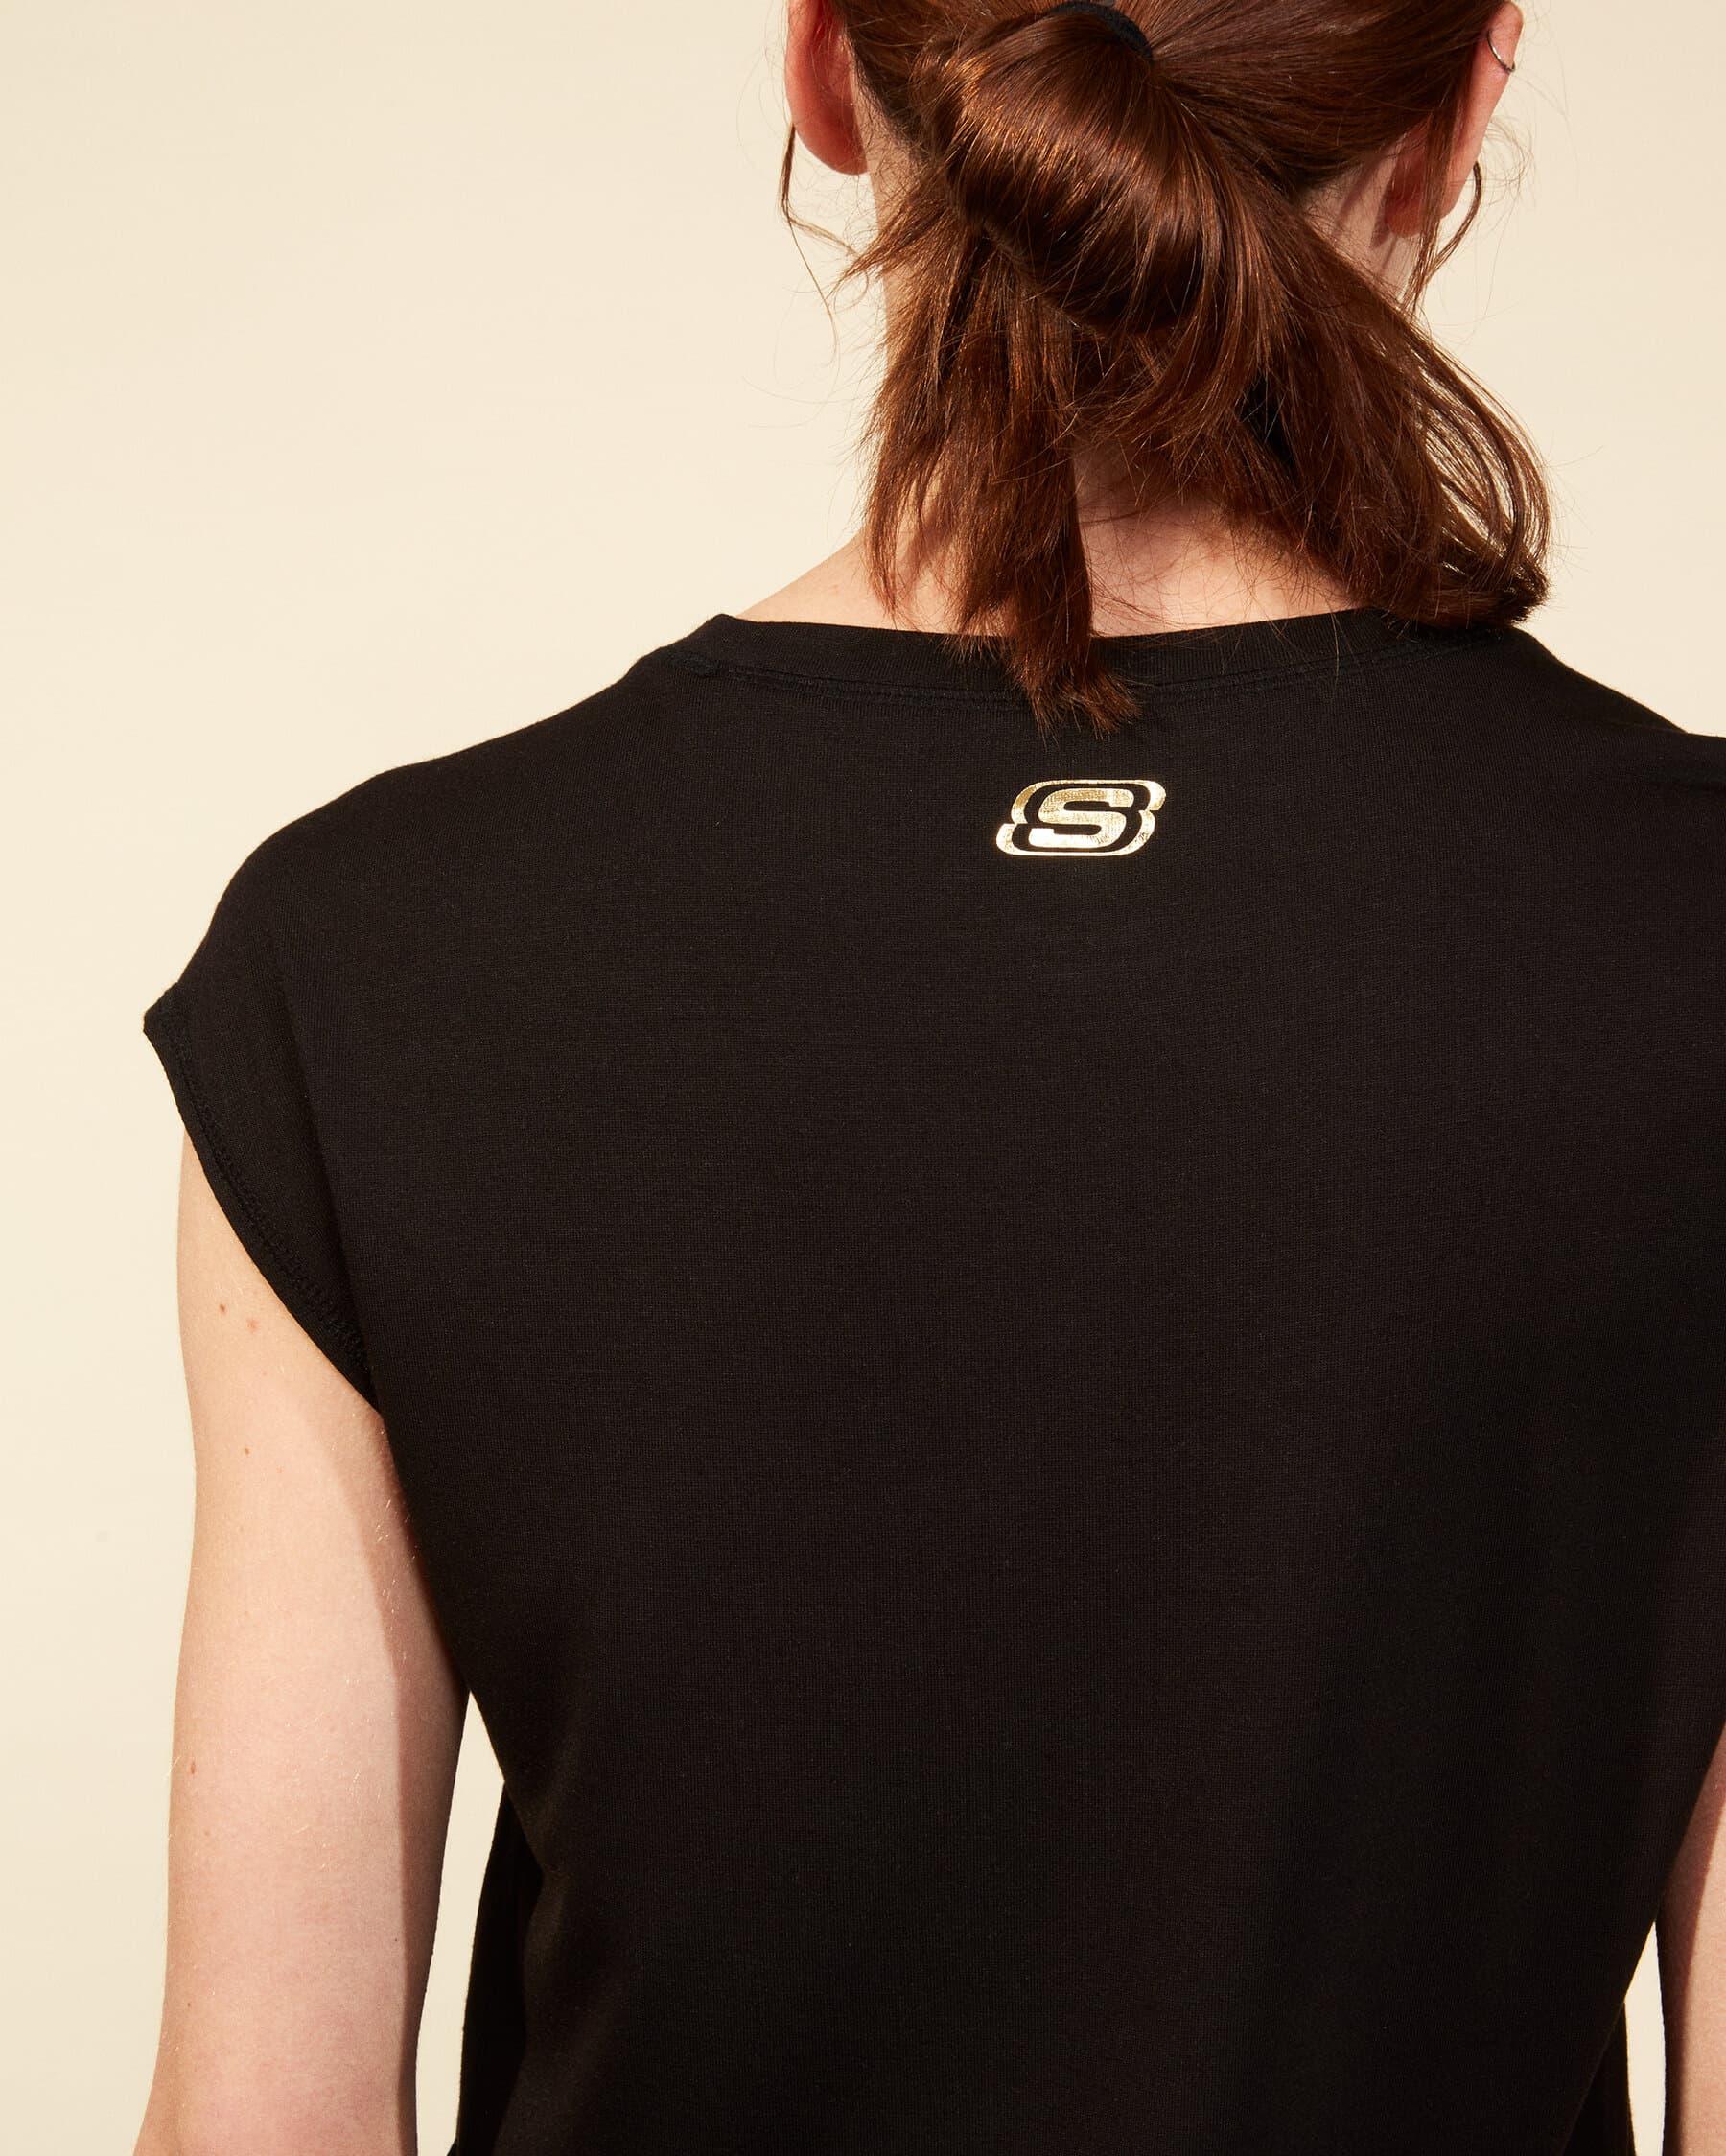 Graphic Bisiklet Yaka Kadın Siyah Tişört (S211289-001)